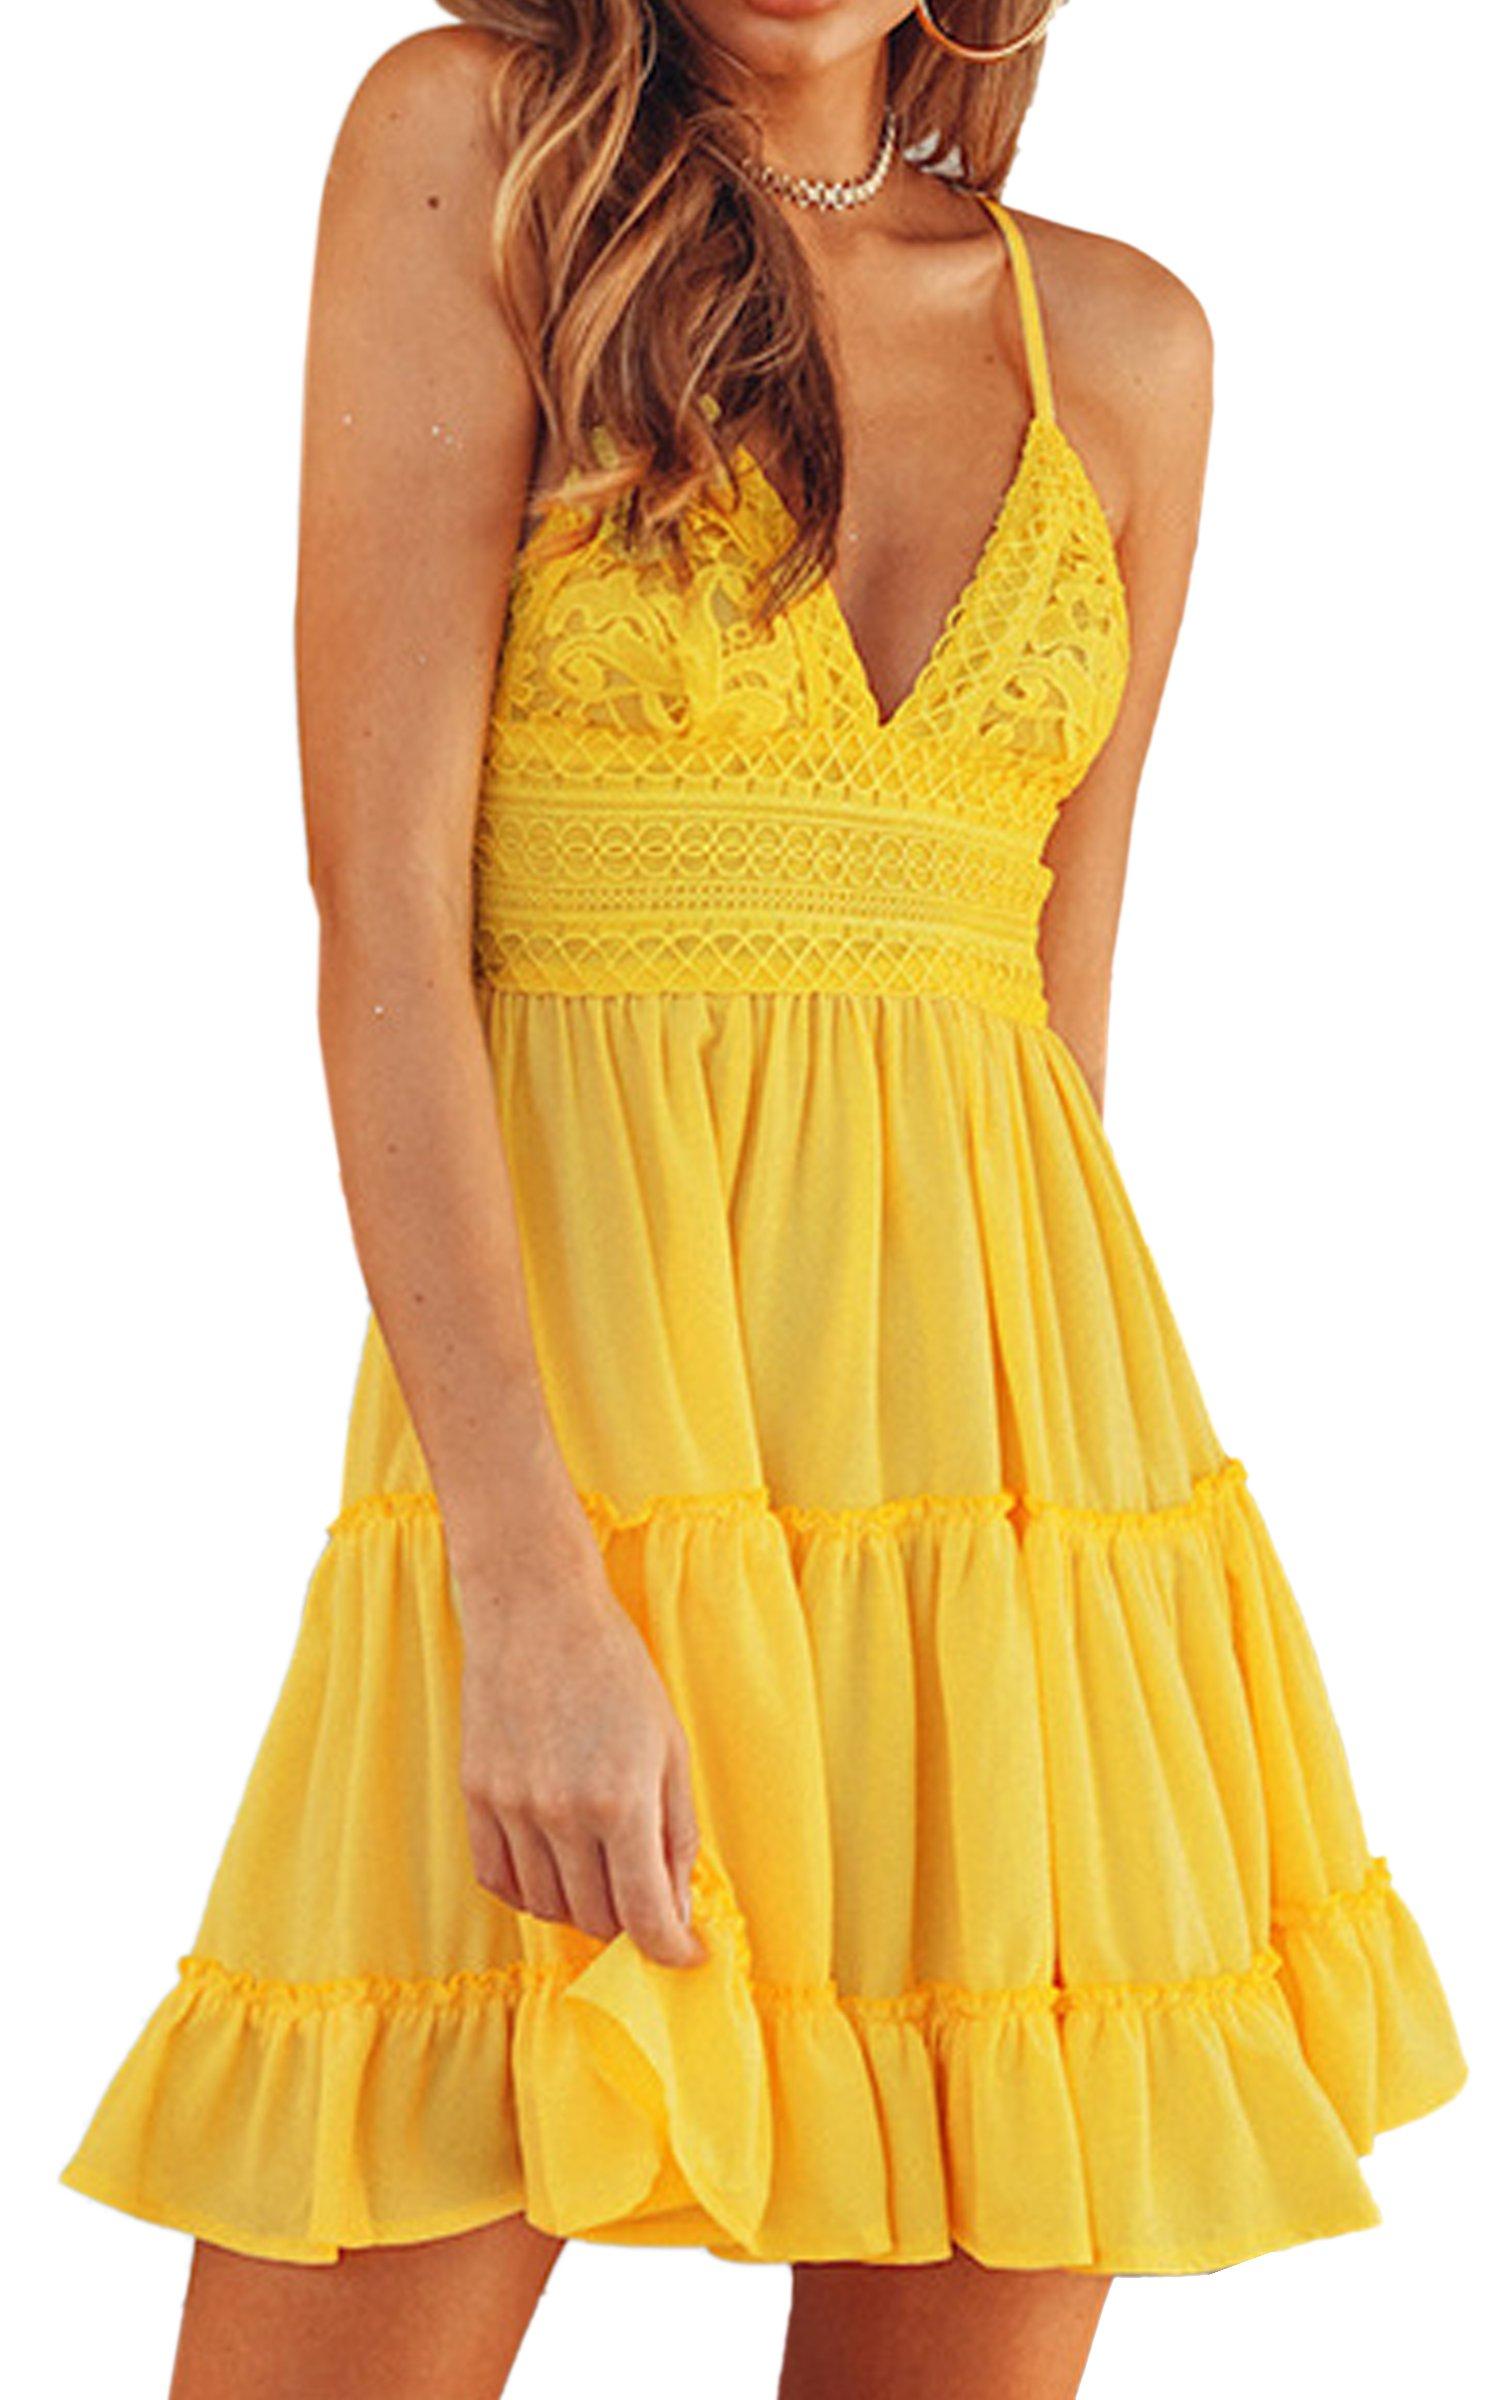 Available at Amazon: ECOWISH Women's V-Neck Spaghetti Strap Bowknot Backless Sleeveless Lace Mini Swing Skater Dress